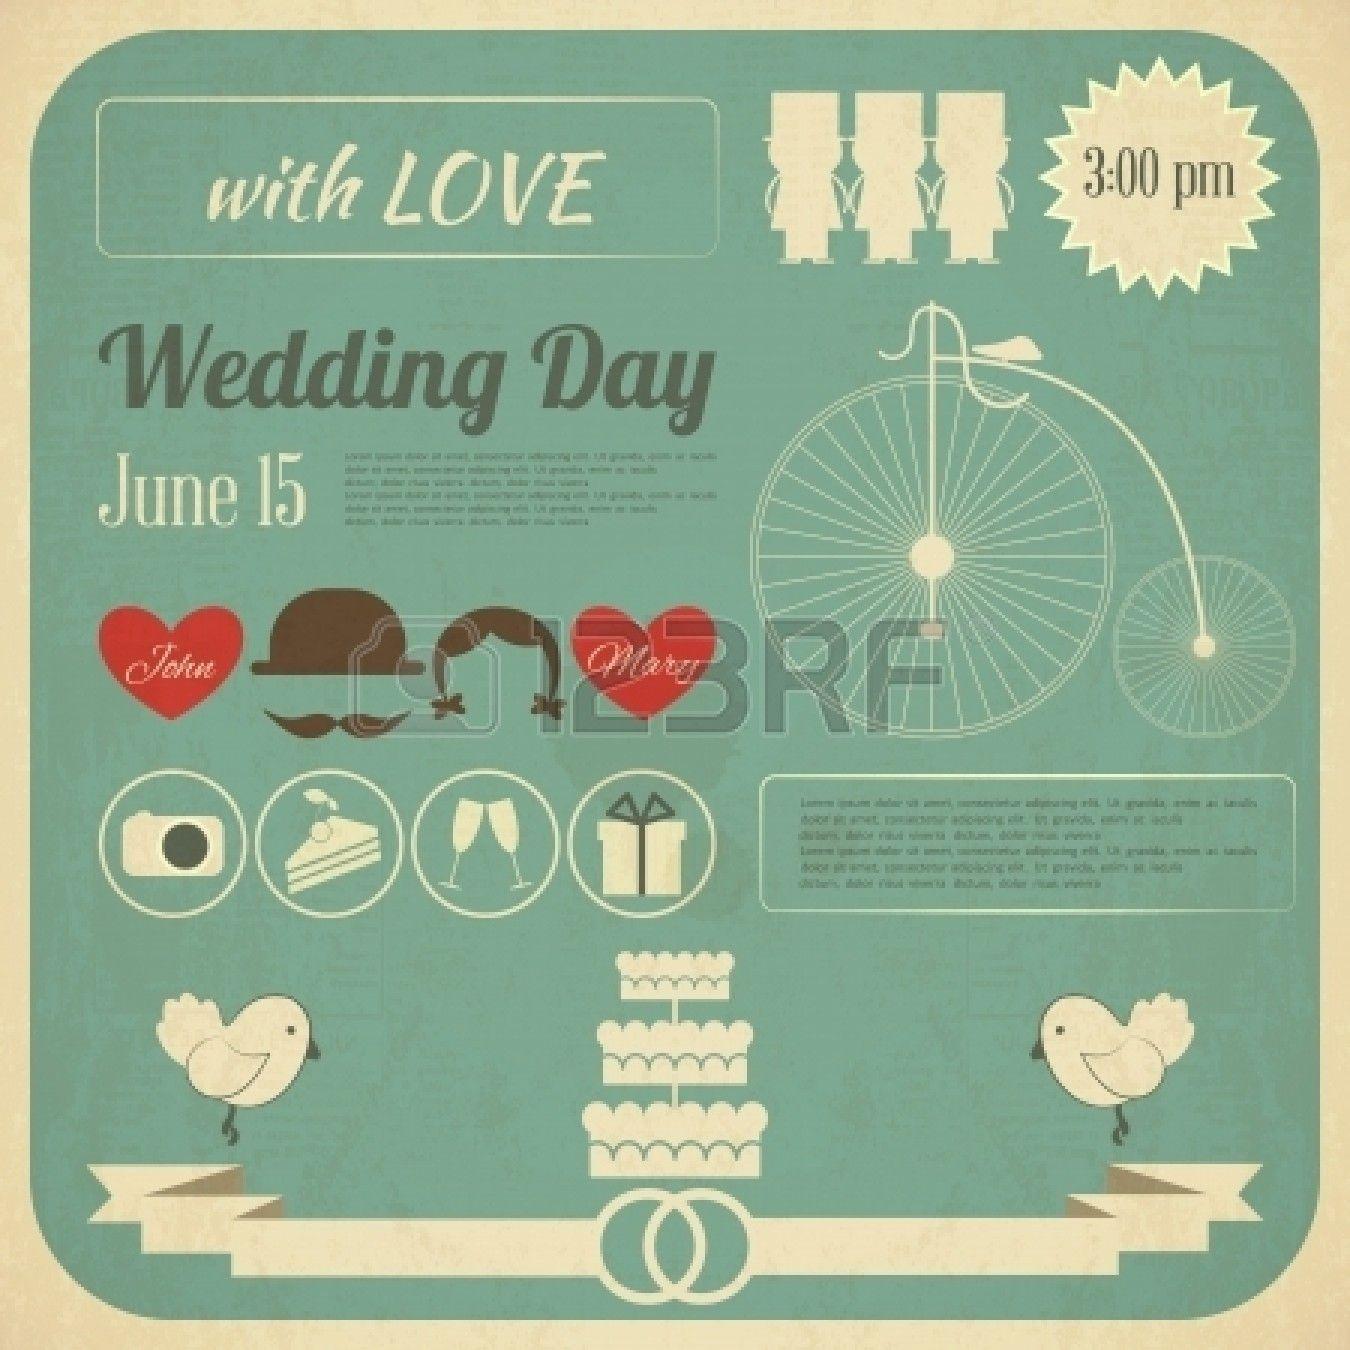 Wedding Invitation Card In Retro Infographics Style Vintage Invitation Cards Wedding Invitation Cards Wedding Invitations